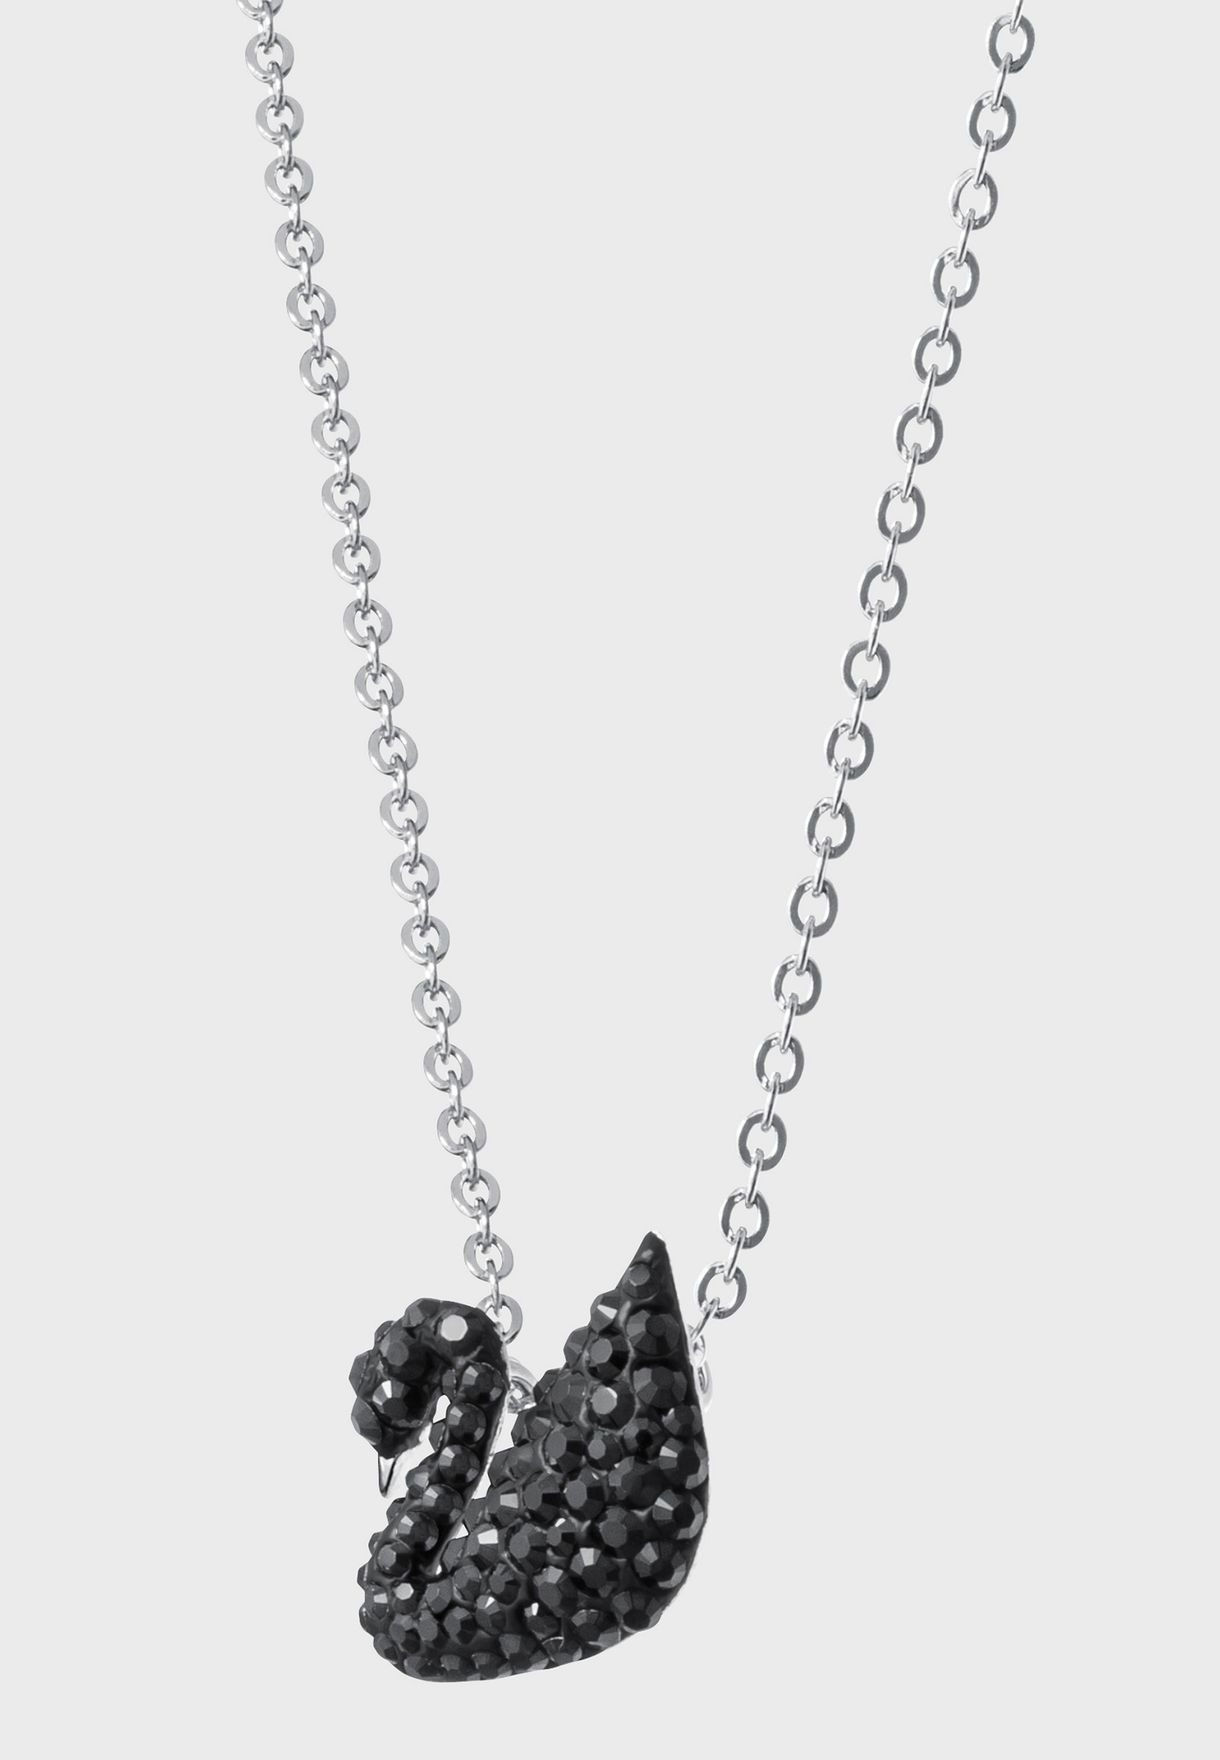 Small Iconic Swan Pendant Black Rhodium Plated